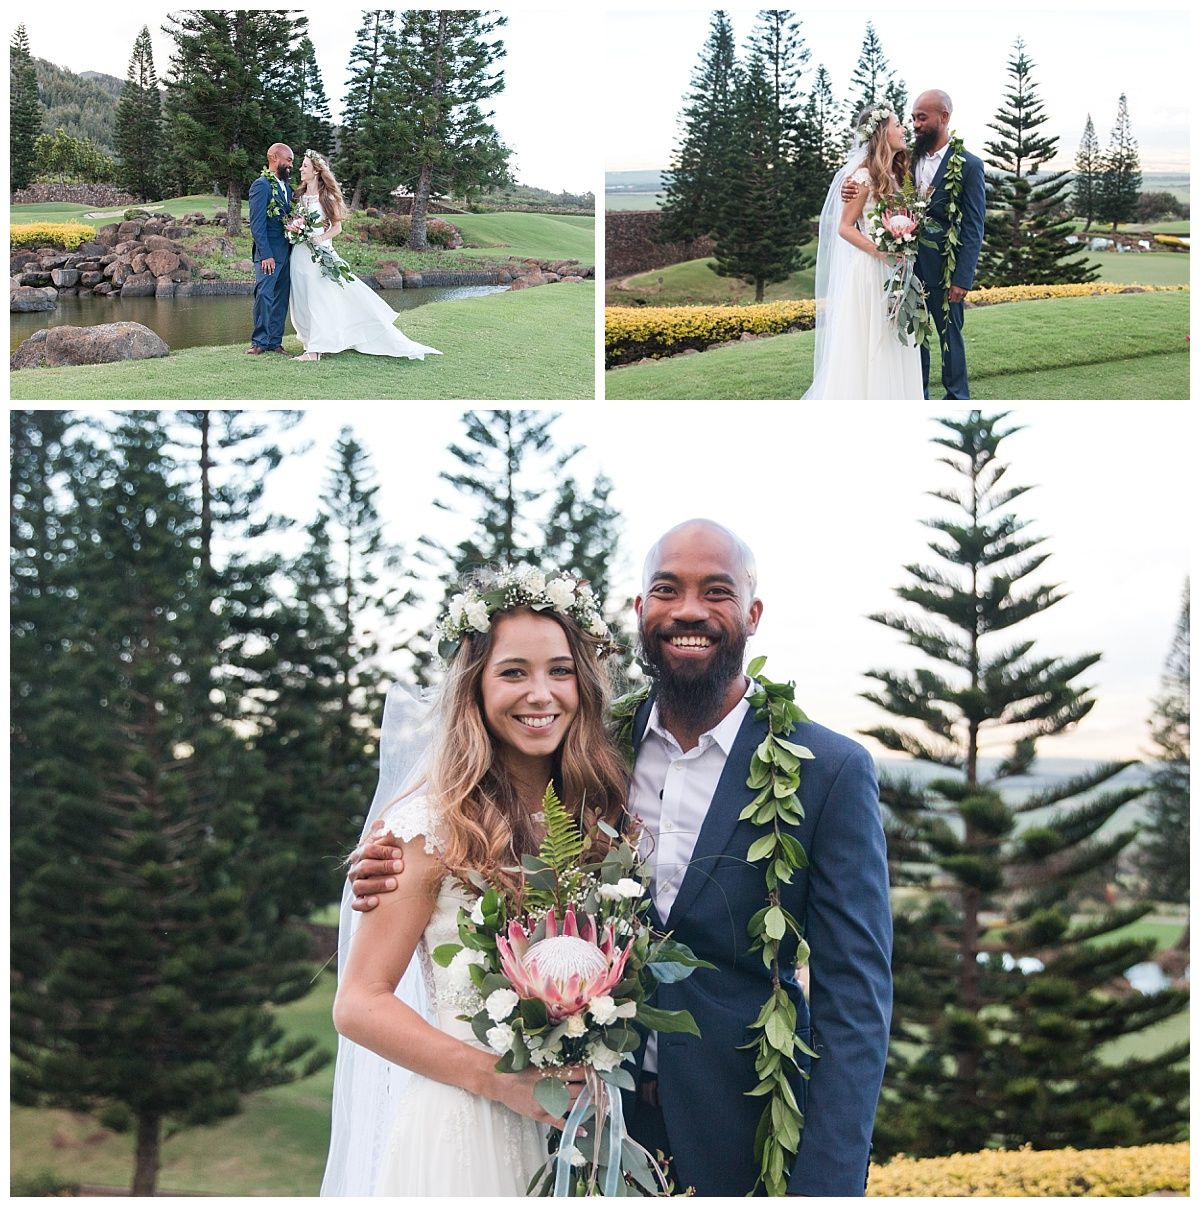 Waikiki Beach Wedding Ceremony: The Detail Ceremony Shots. Including A Homemade Haku Lei